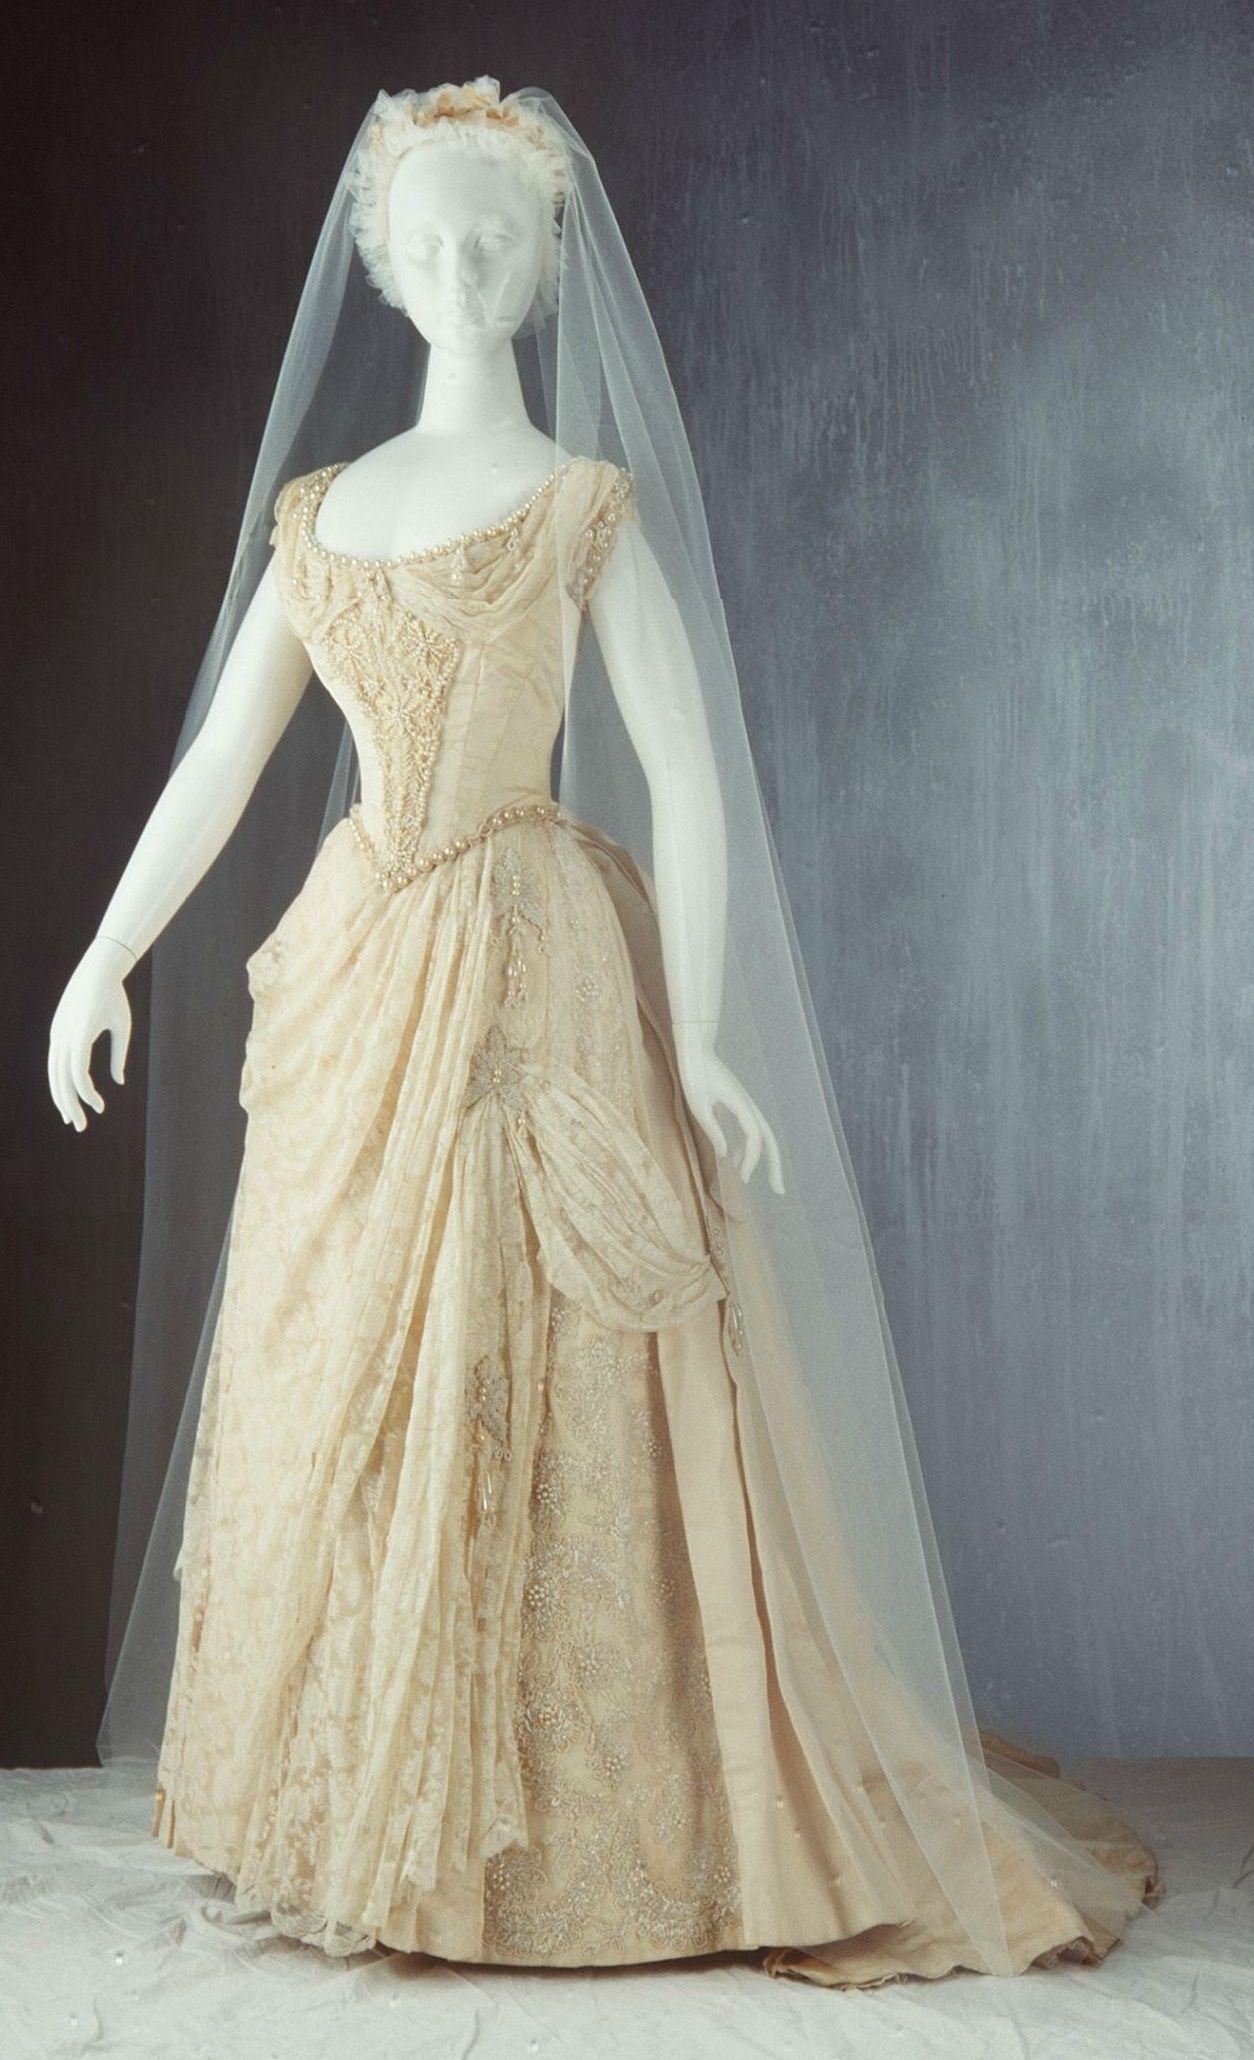 Wedding Dress 1887, Australian, silk faille with machine